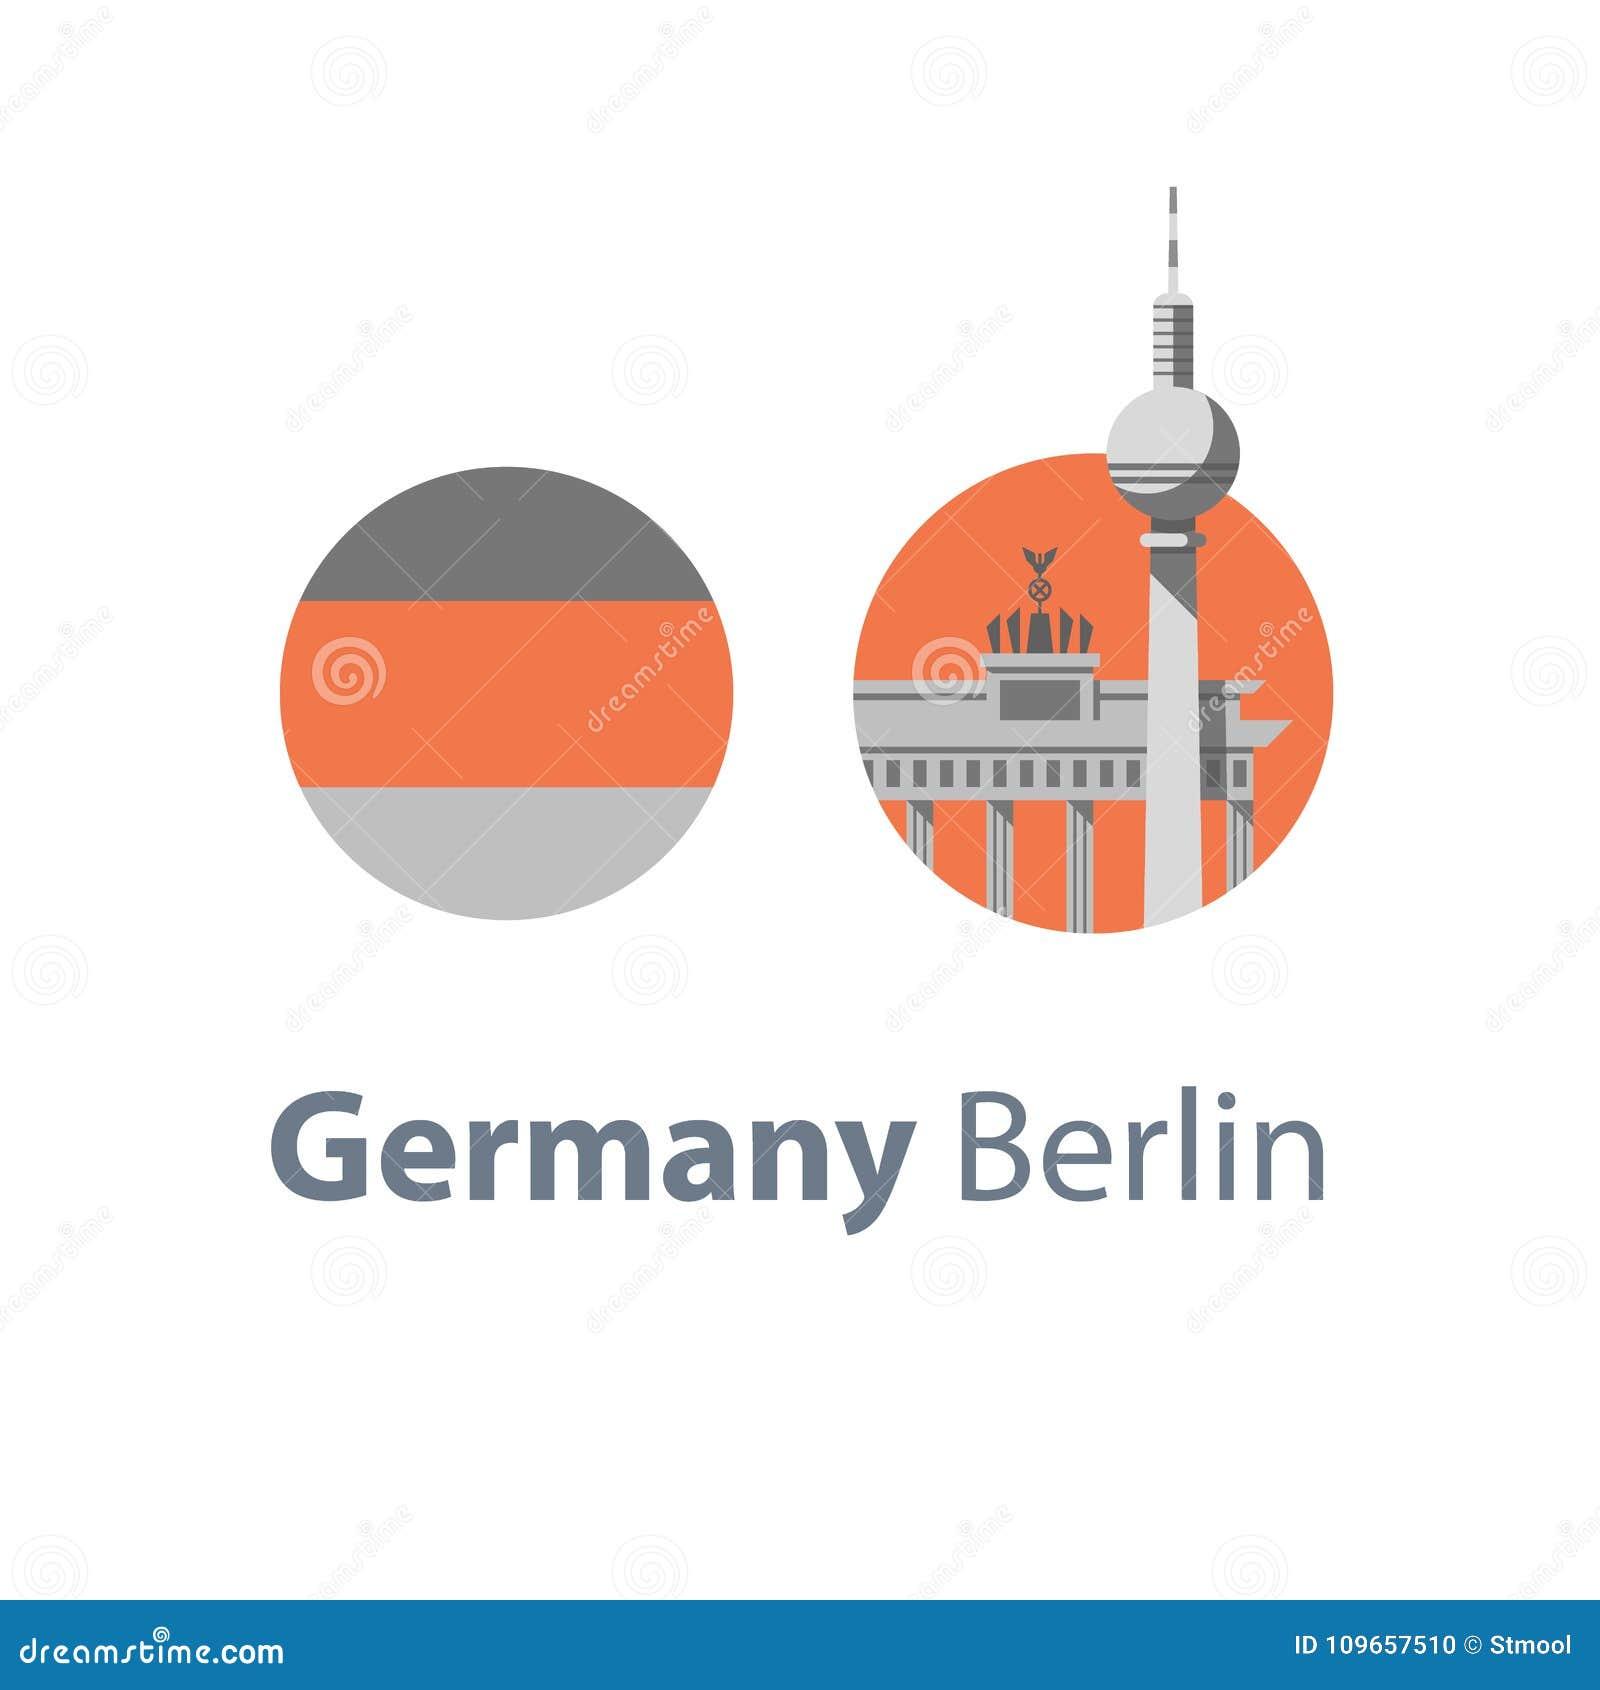 Berlin Symbol Brandenburg Gate And Tower Germany Travel Download Destination Famous Landmark